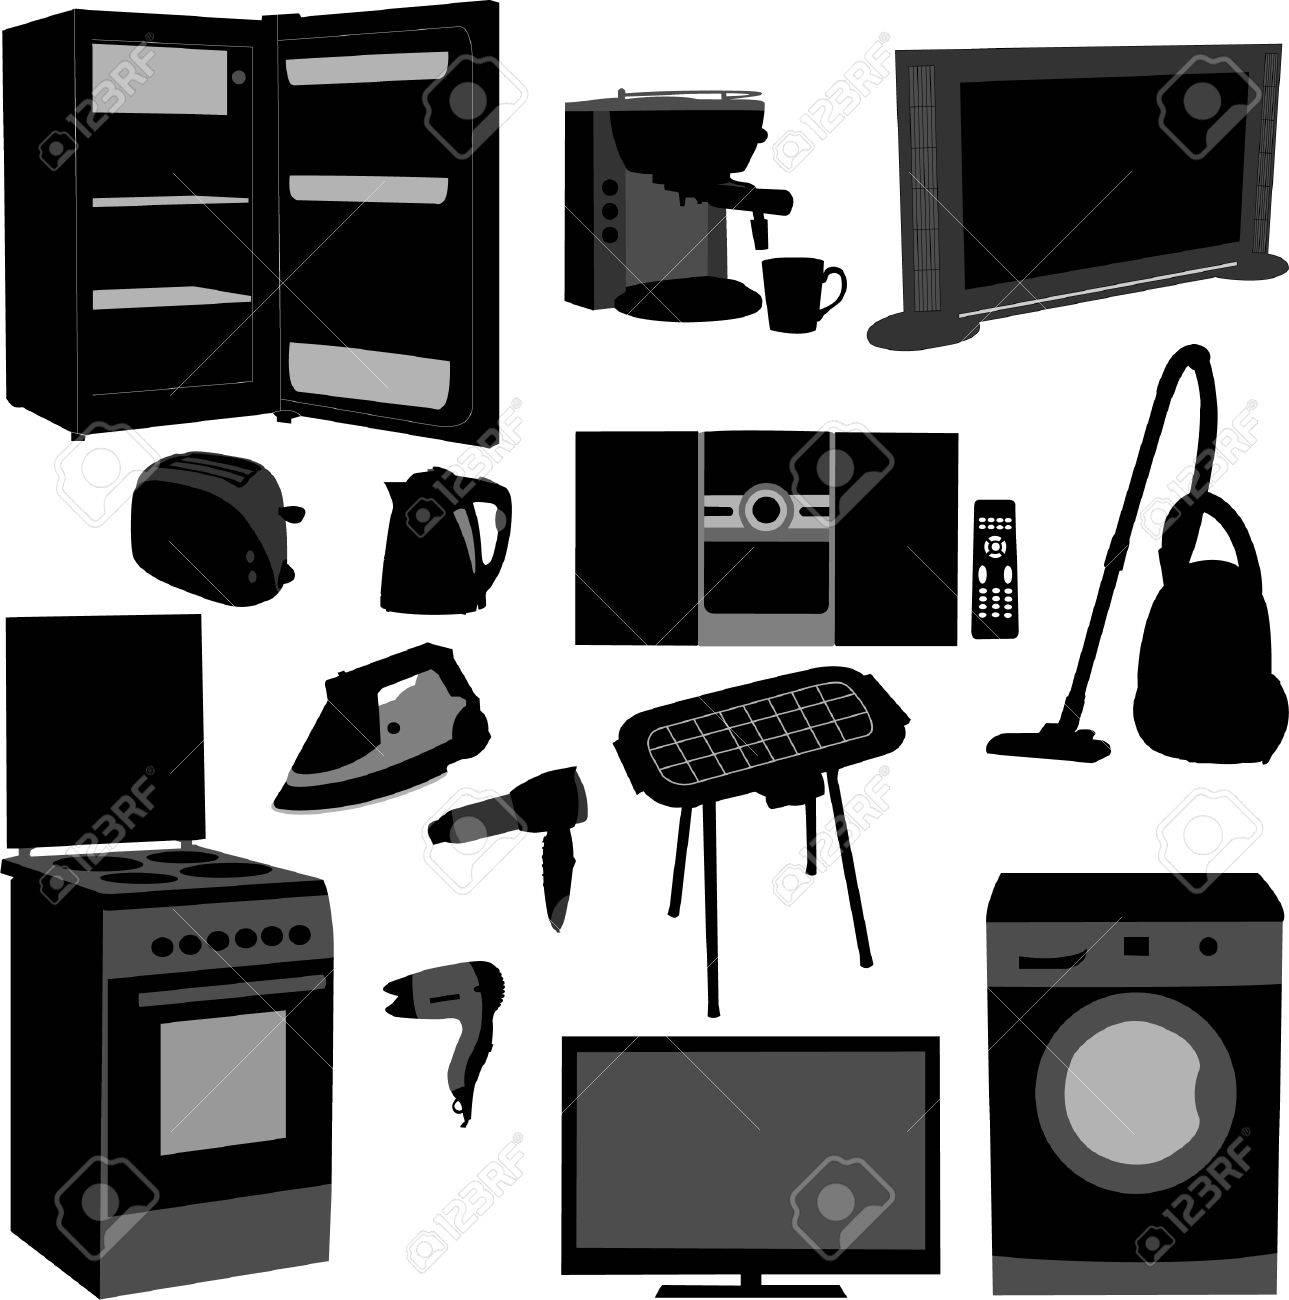 house appliance - vector Stock Vector - 9040567